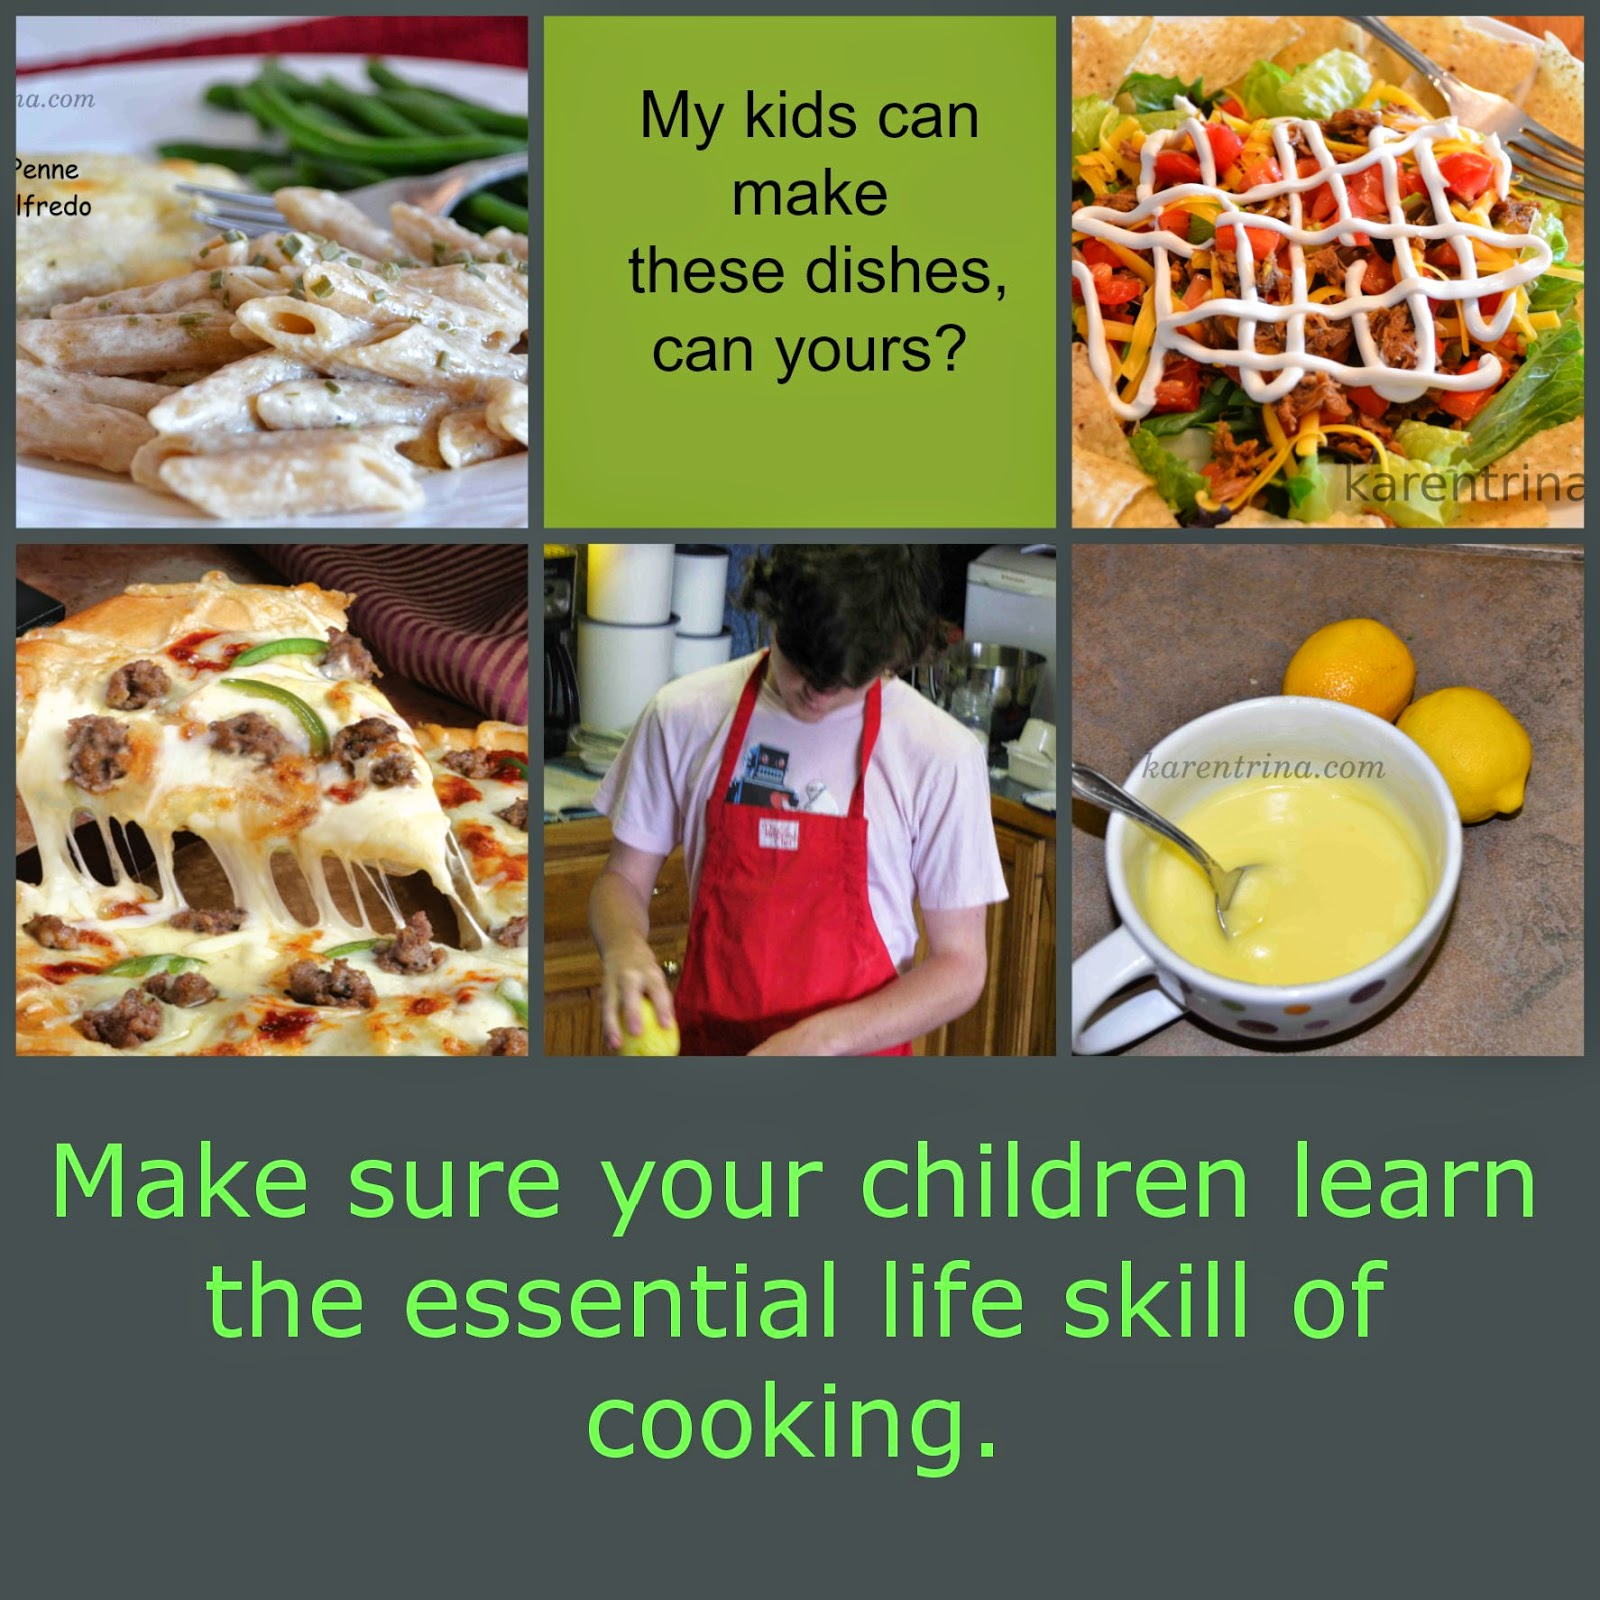 Karentrina Childress Essential Life Skills Cooking